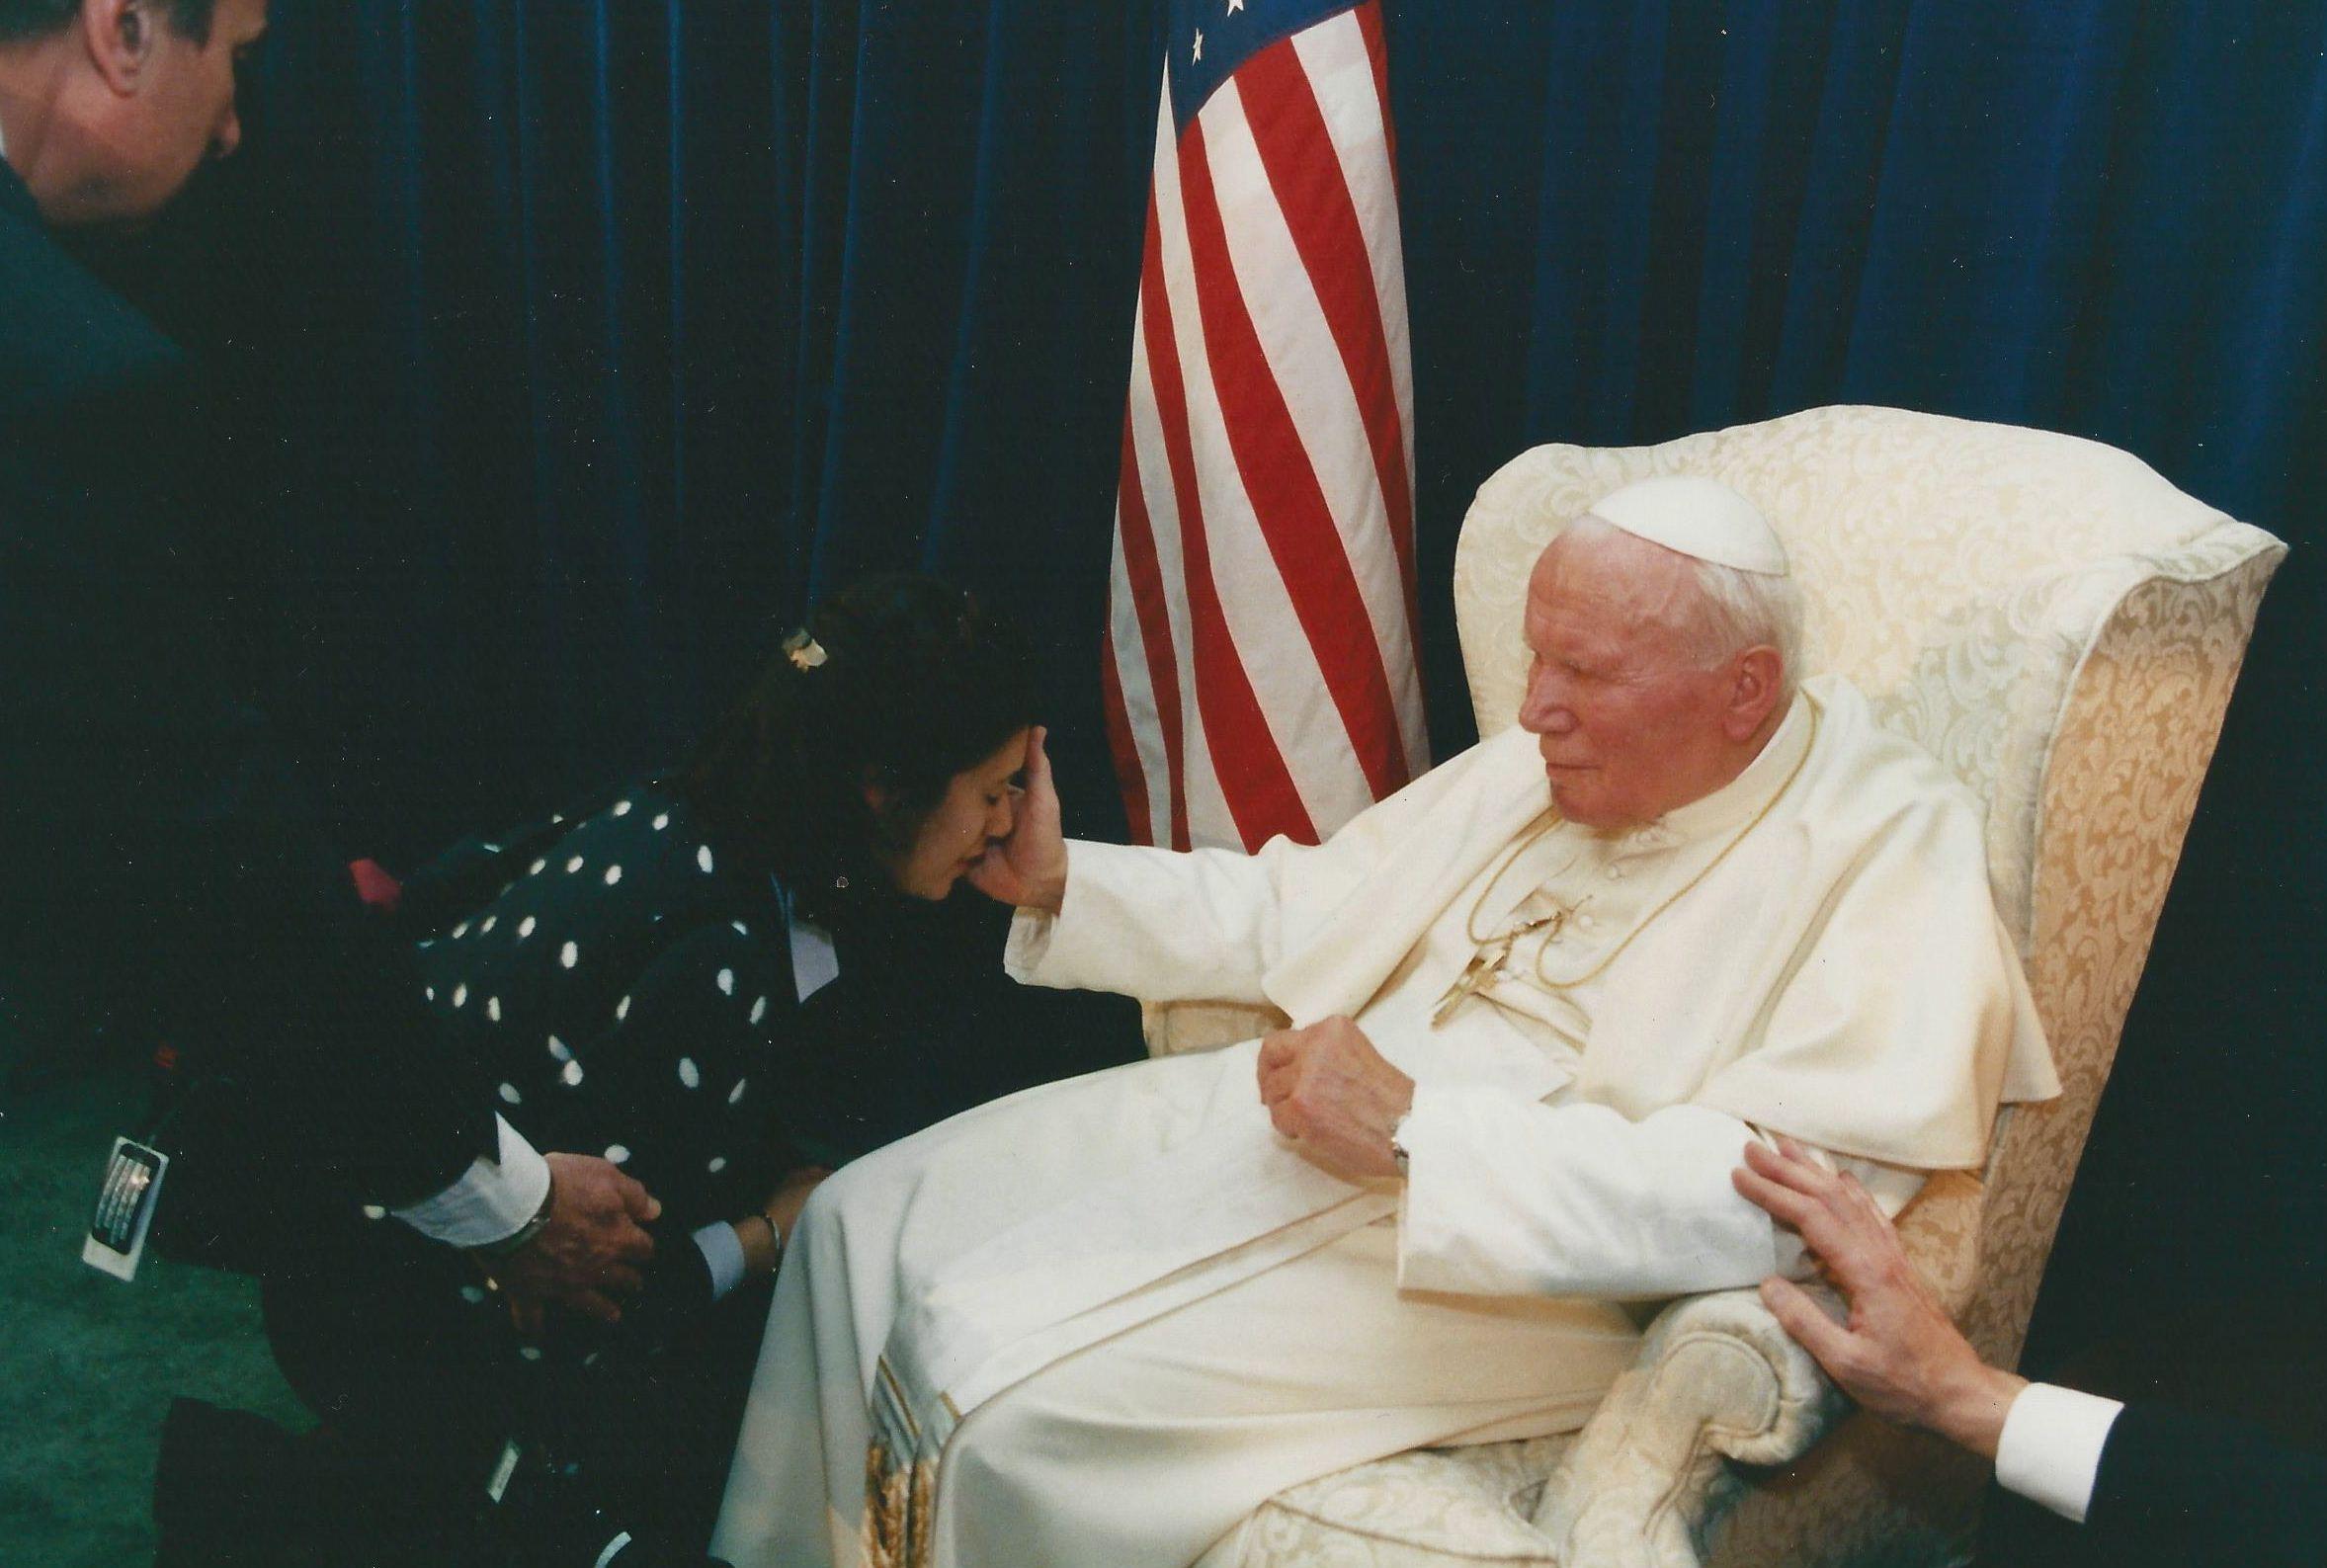 White House Photographer Joyce Naltchayan meets Pope John Paul II